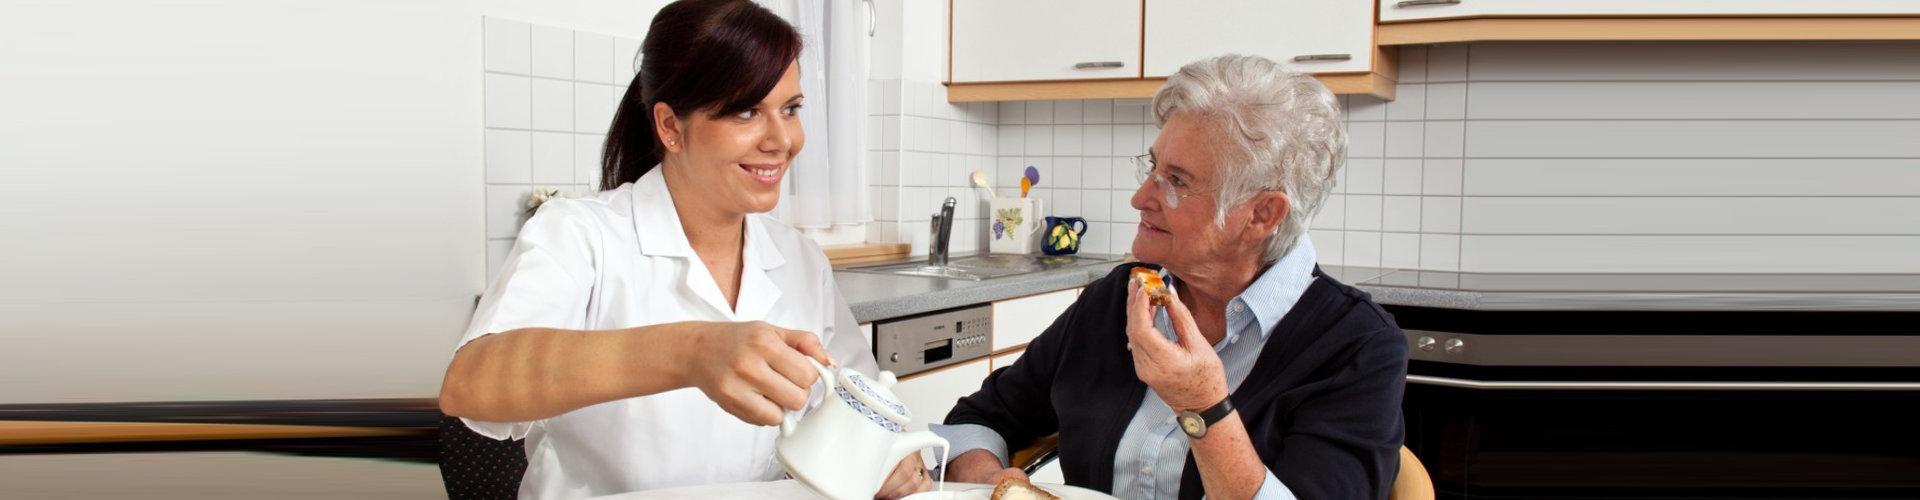 a caregiver serving food to senior